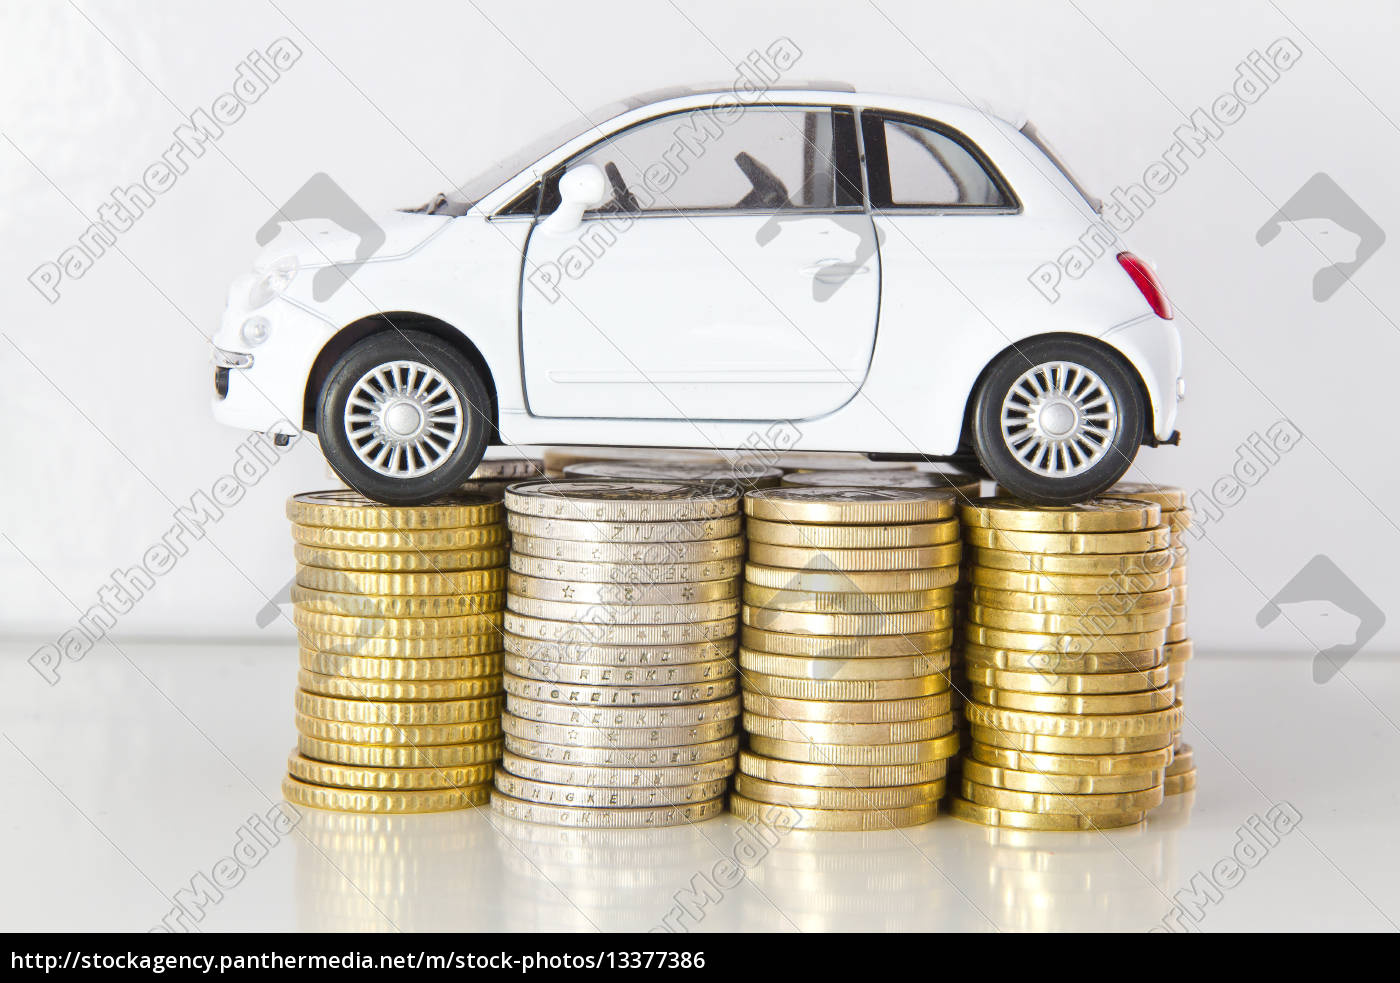 autokosten - 13377386